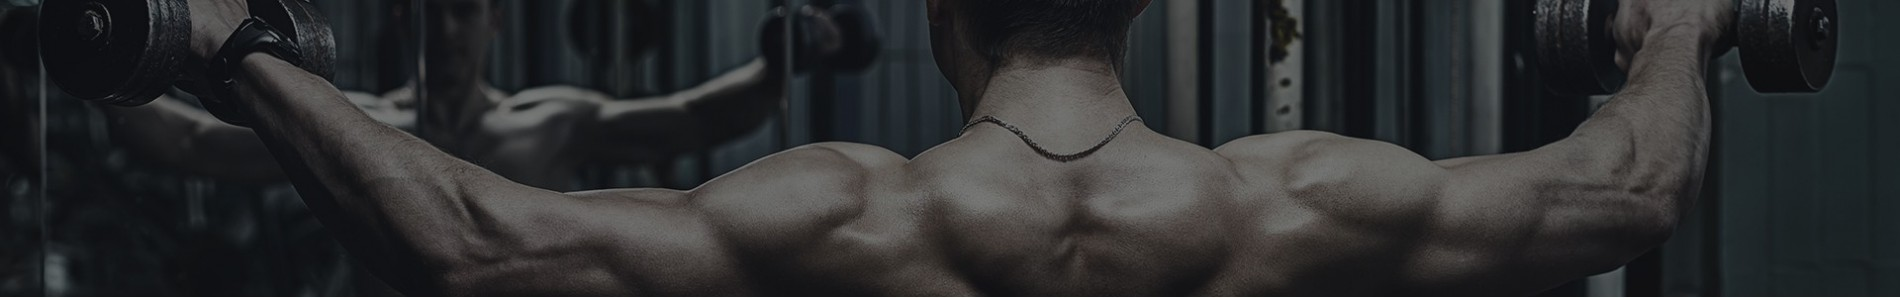 Presses de musculation